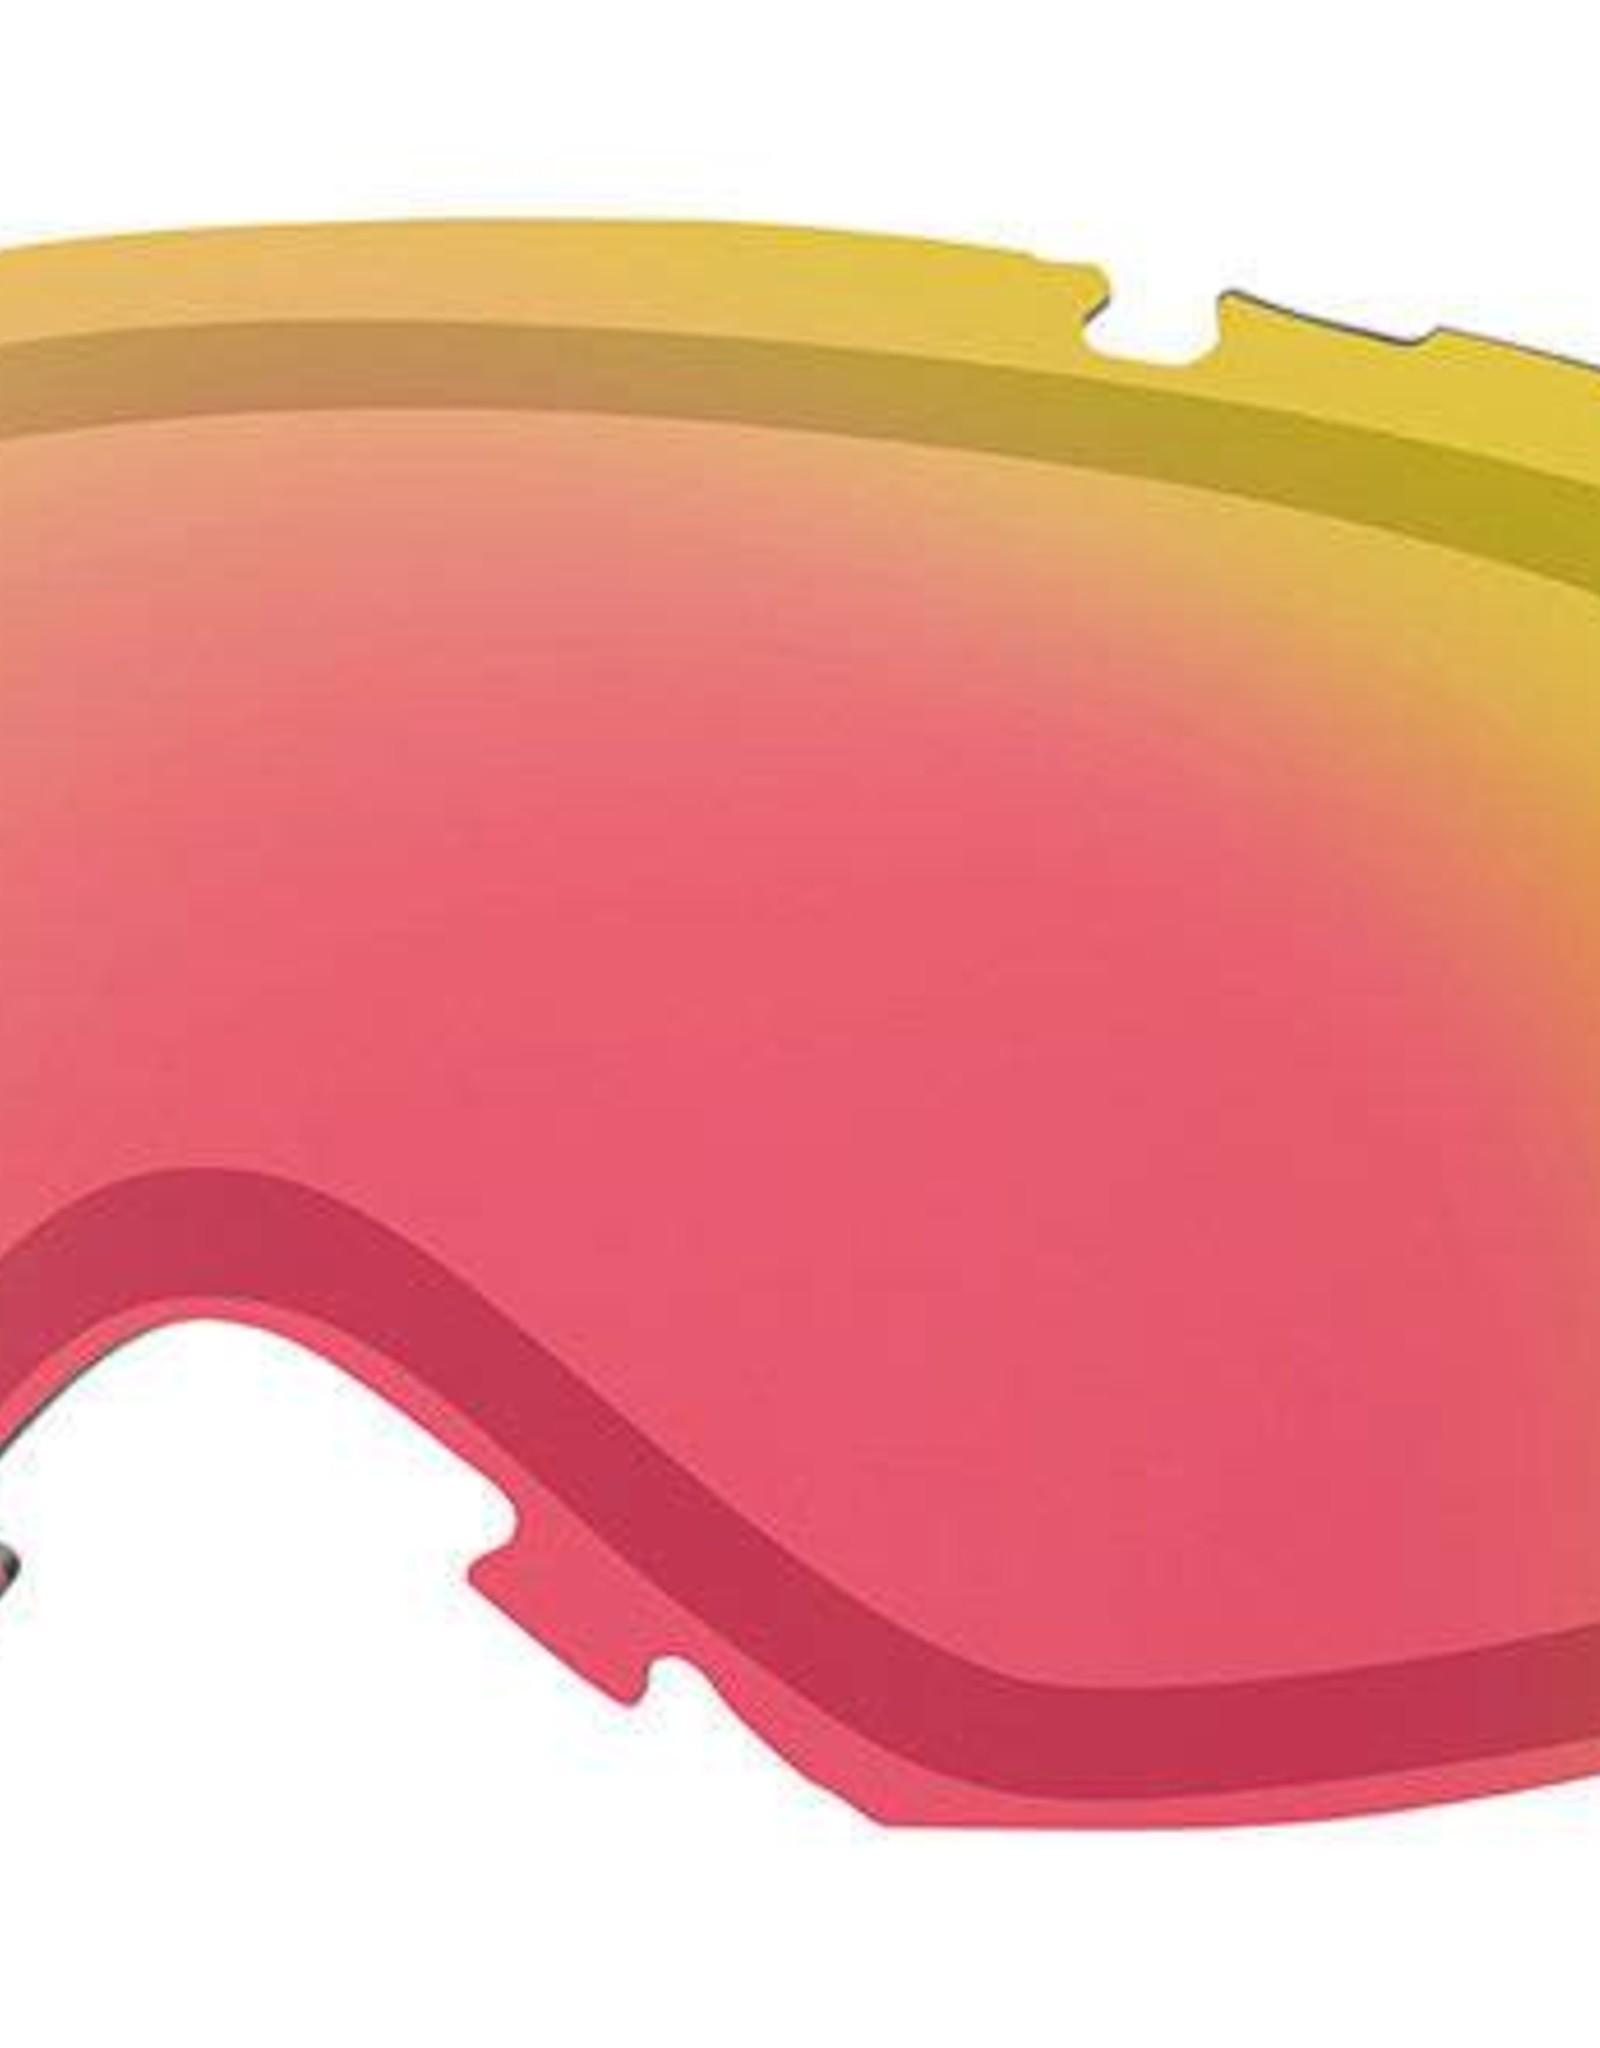 Smith Optics Smith - I/OX - Red Sensor Lens